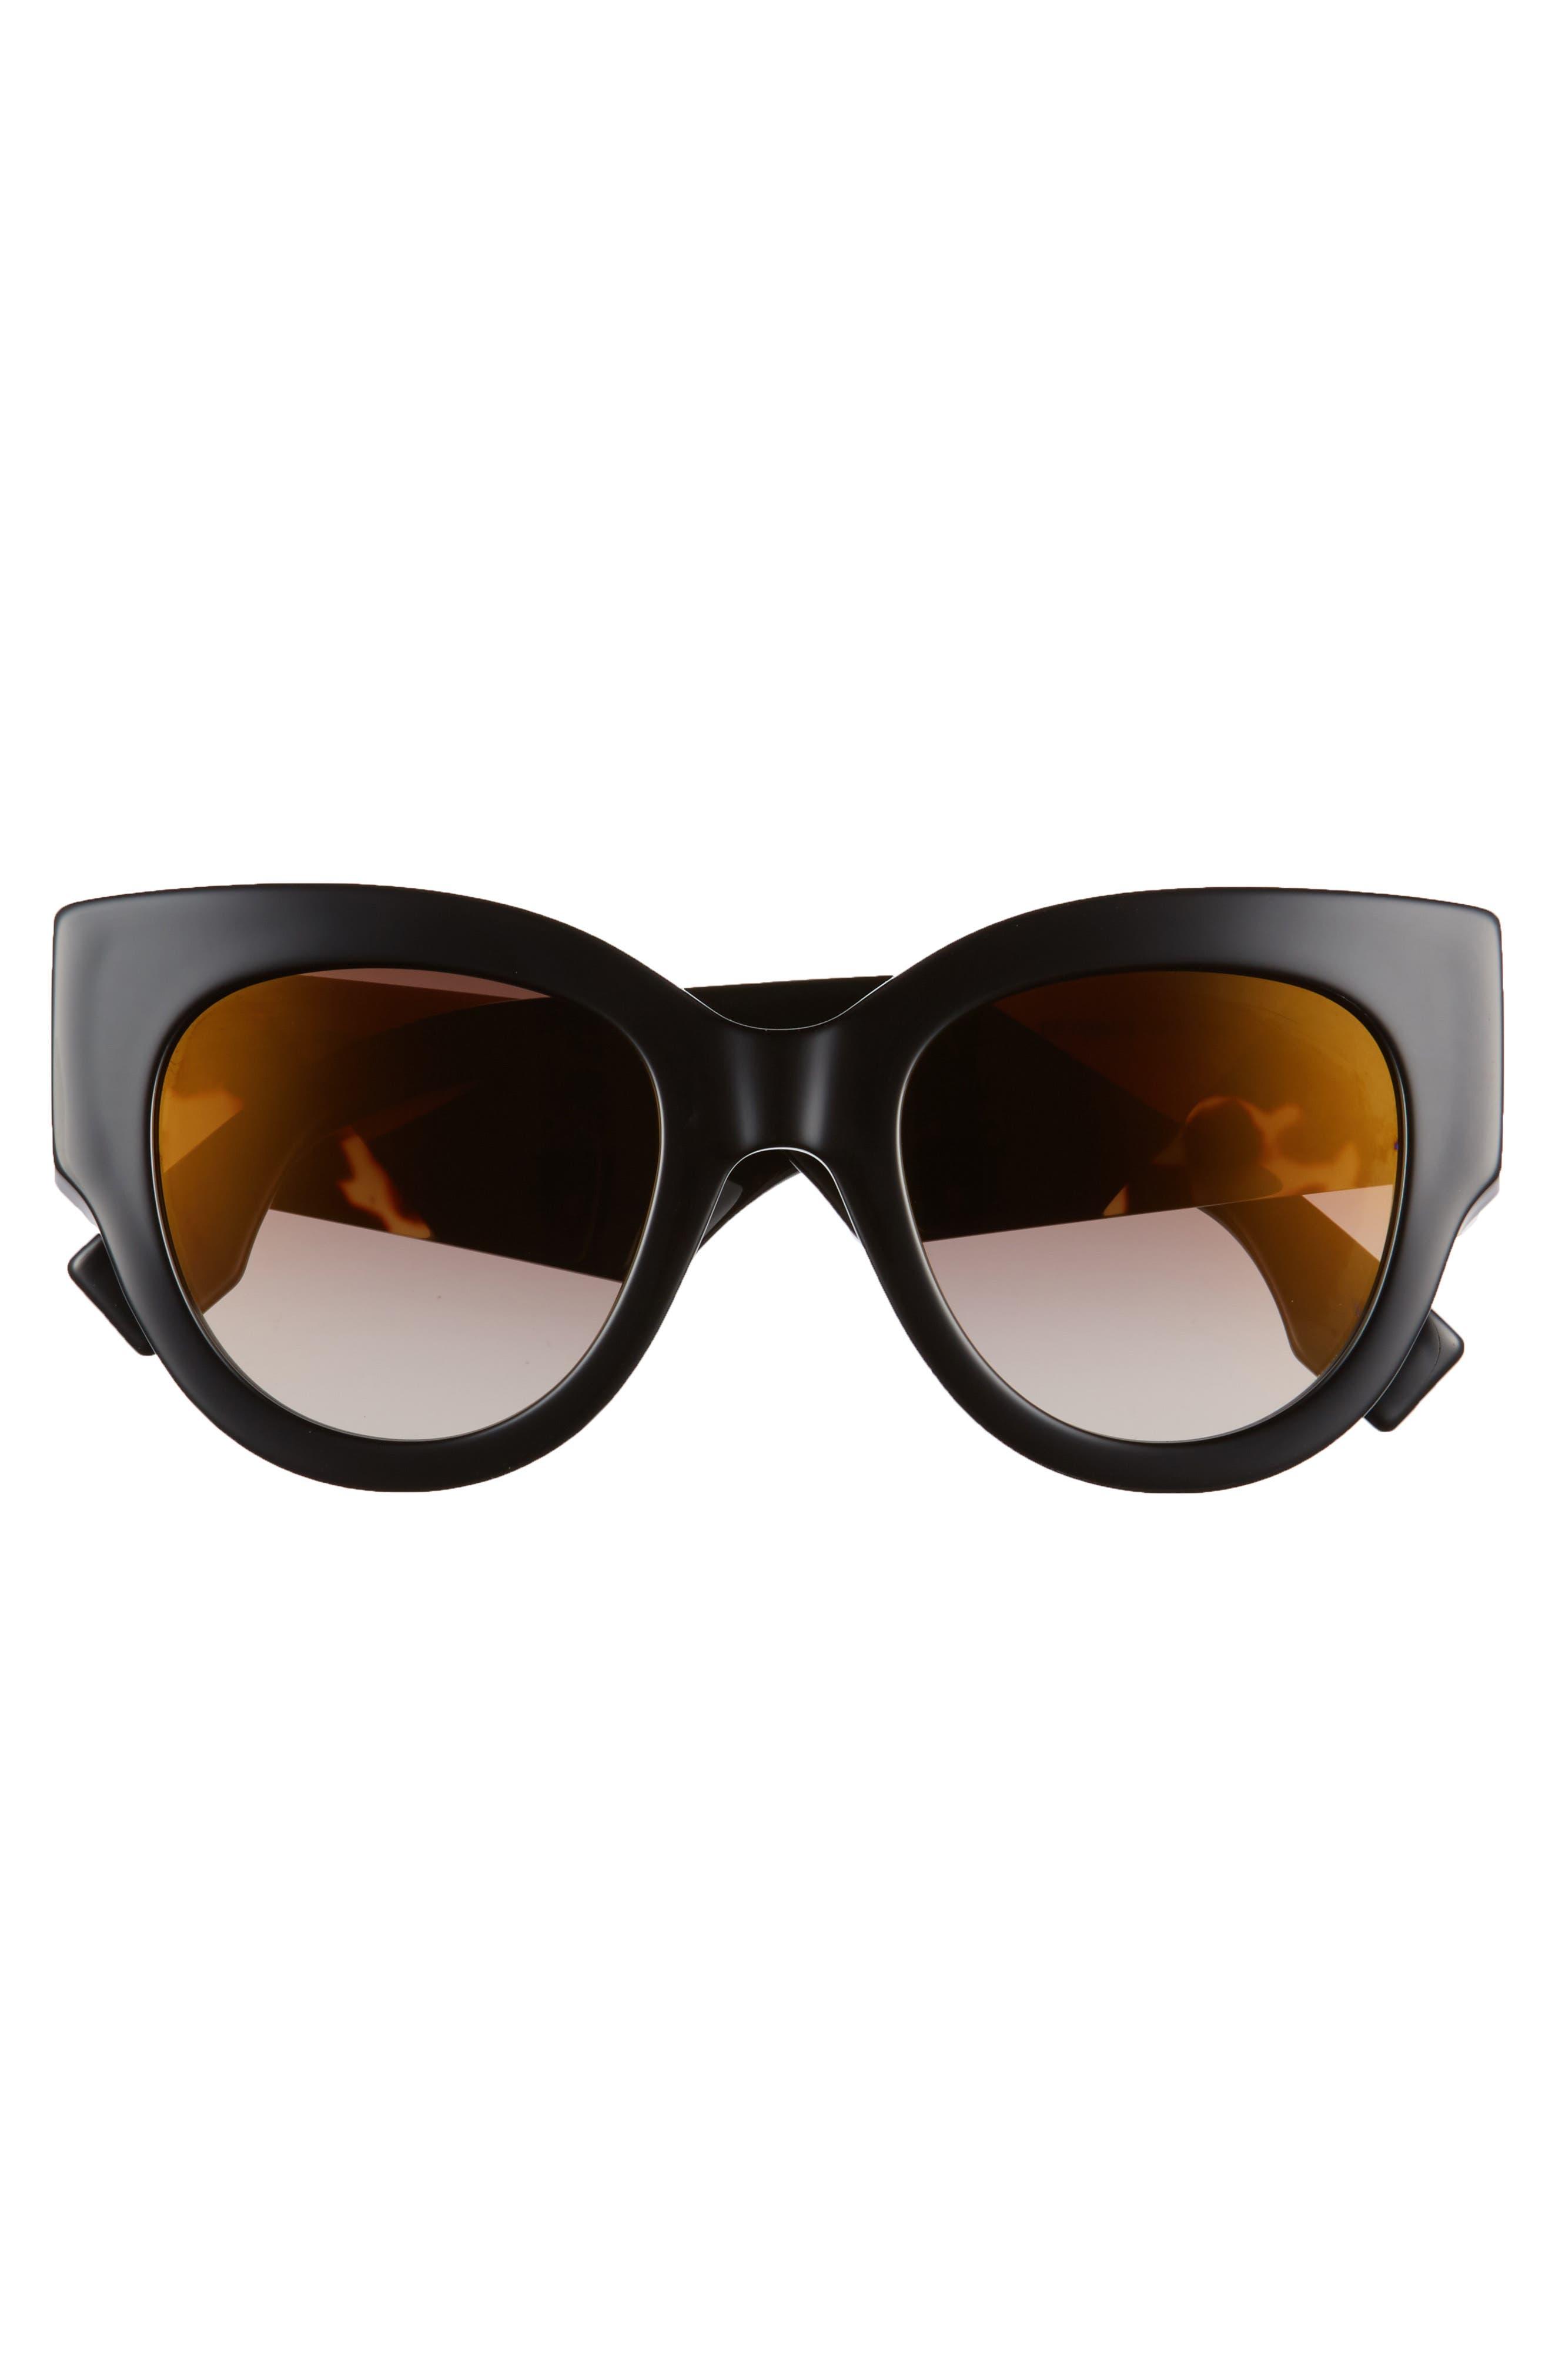 51mm Cat Eye Sunglasses,                             Alternate thumbnail 3, color,                             001